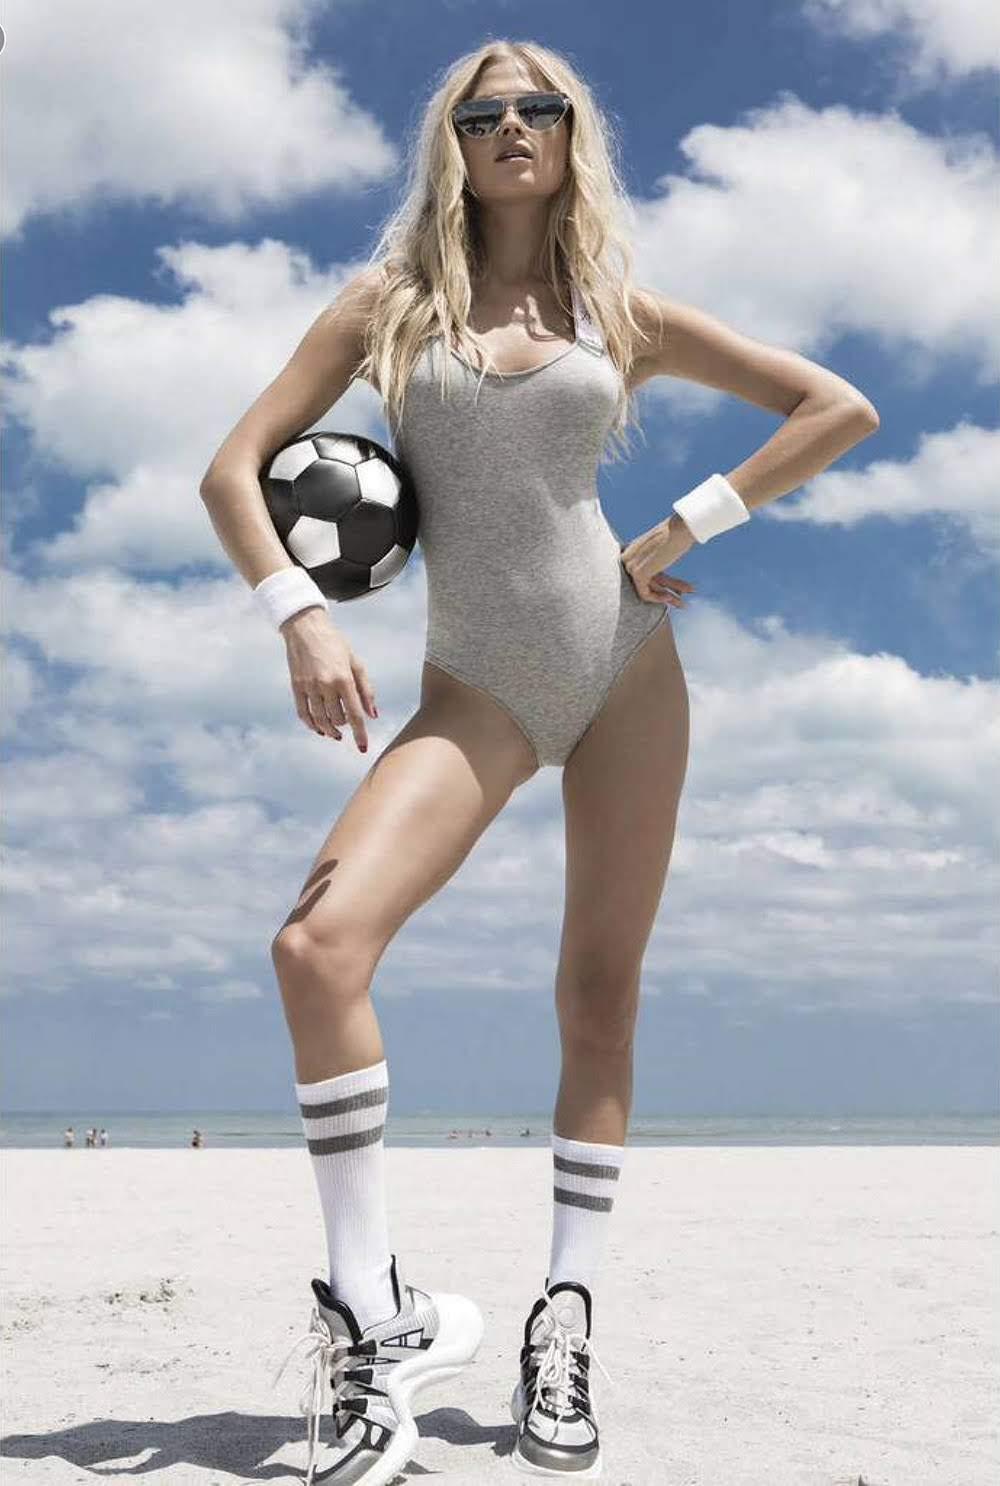 Vita Sidorkina nude (18 foto and video), Tits, Paparazzi, Boobs, cameltoe 2006